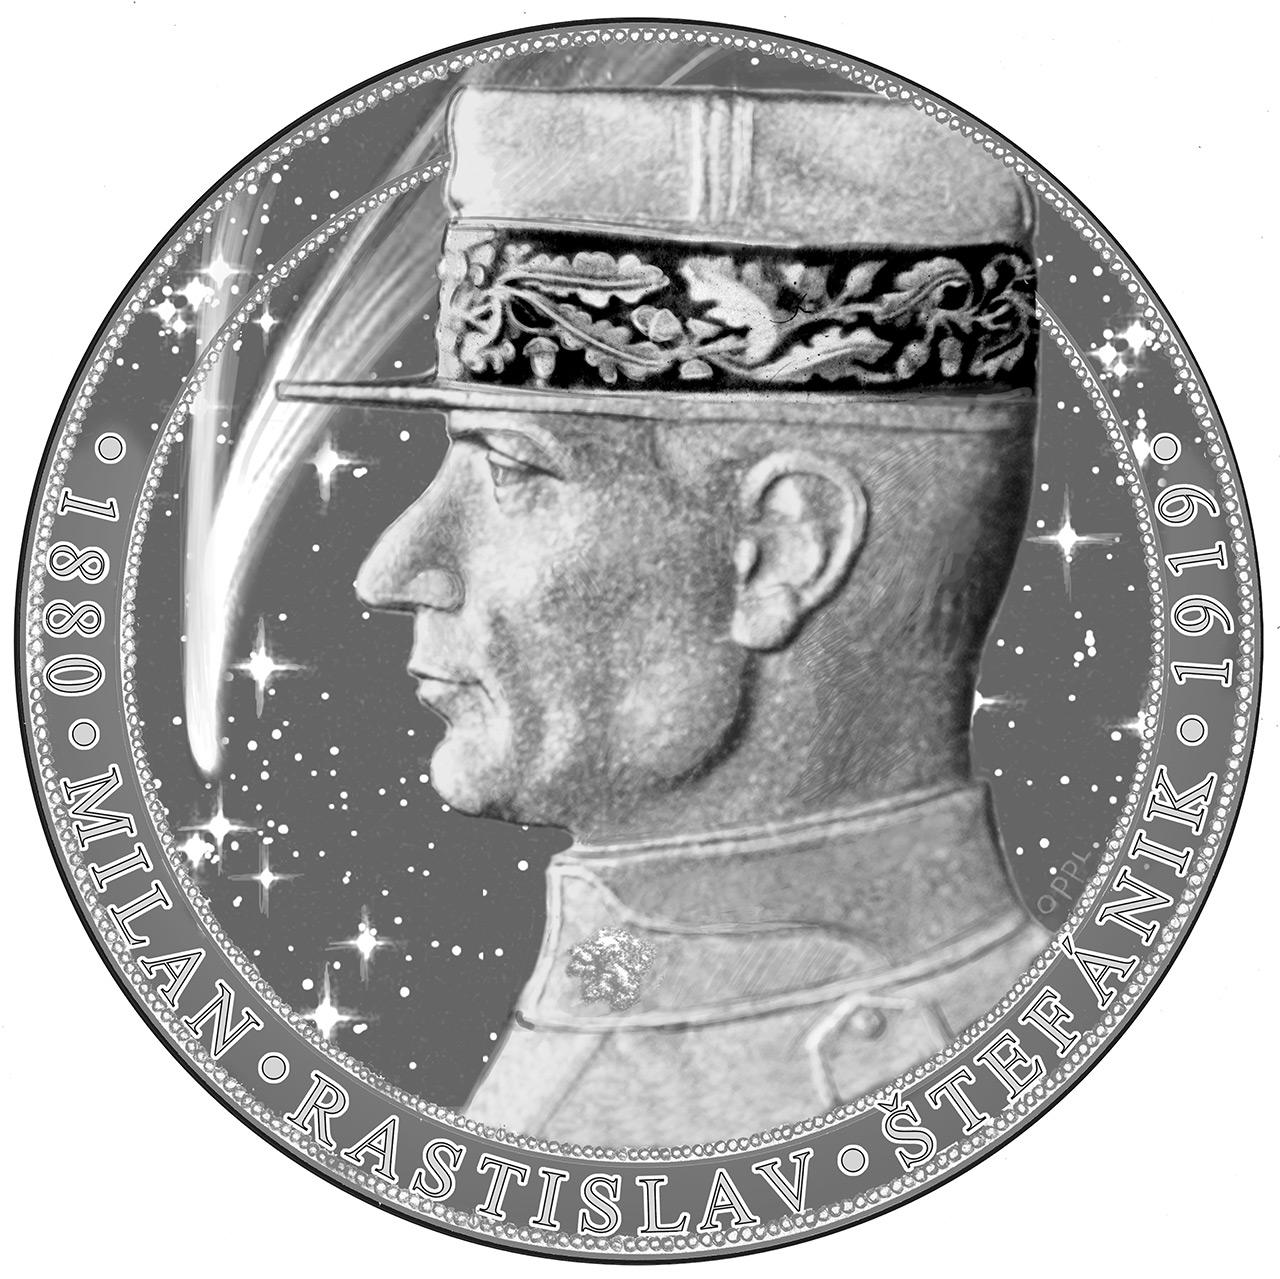 Návrh pamětní medaile Milan Rastislav Štefánik